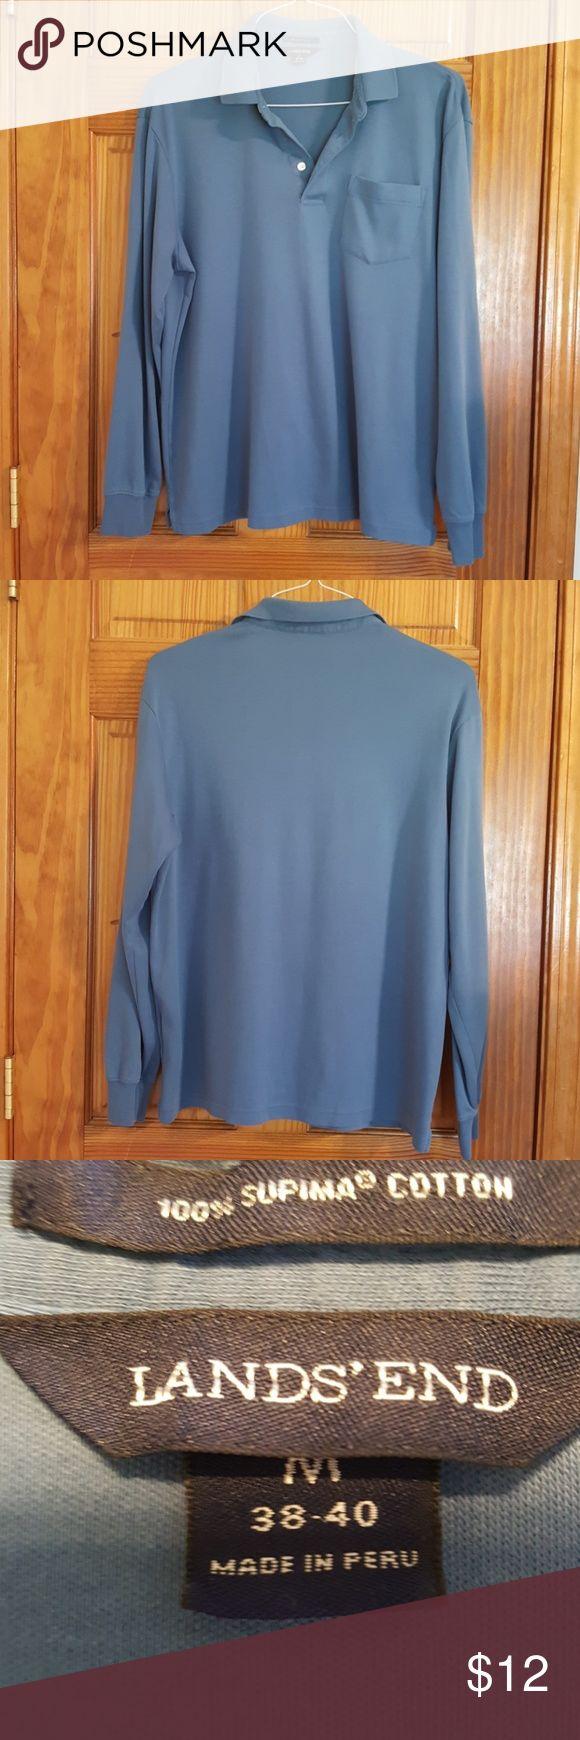 Land's End Long Sleeve Polo shirt Lands  Long Sleeve Polo shirt slate blue Lands' End Shirts Polos